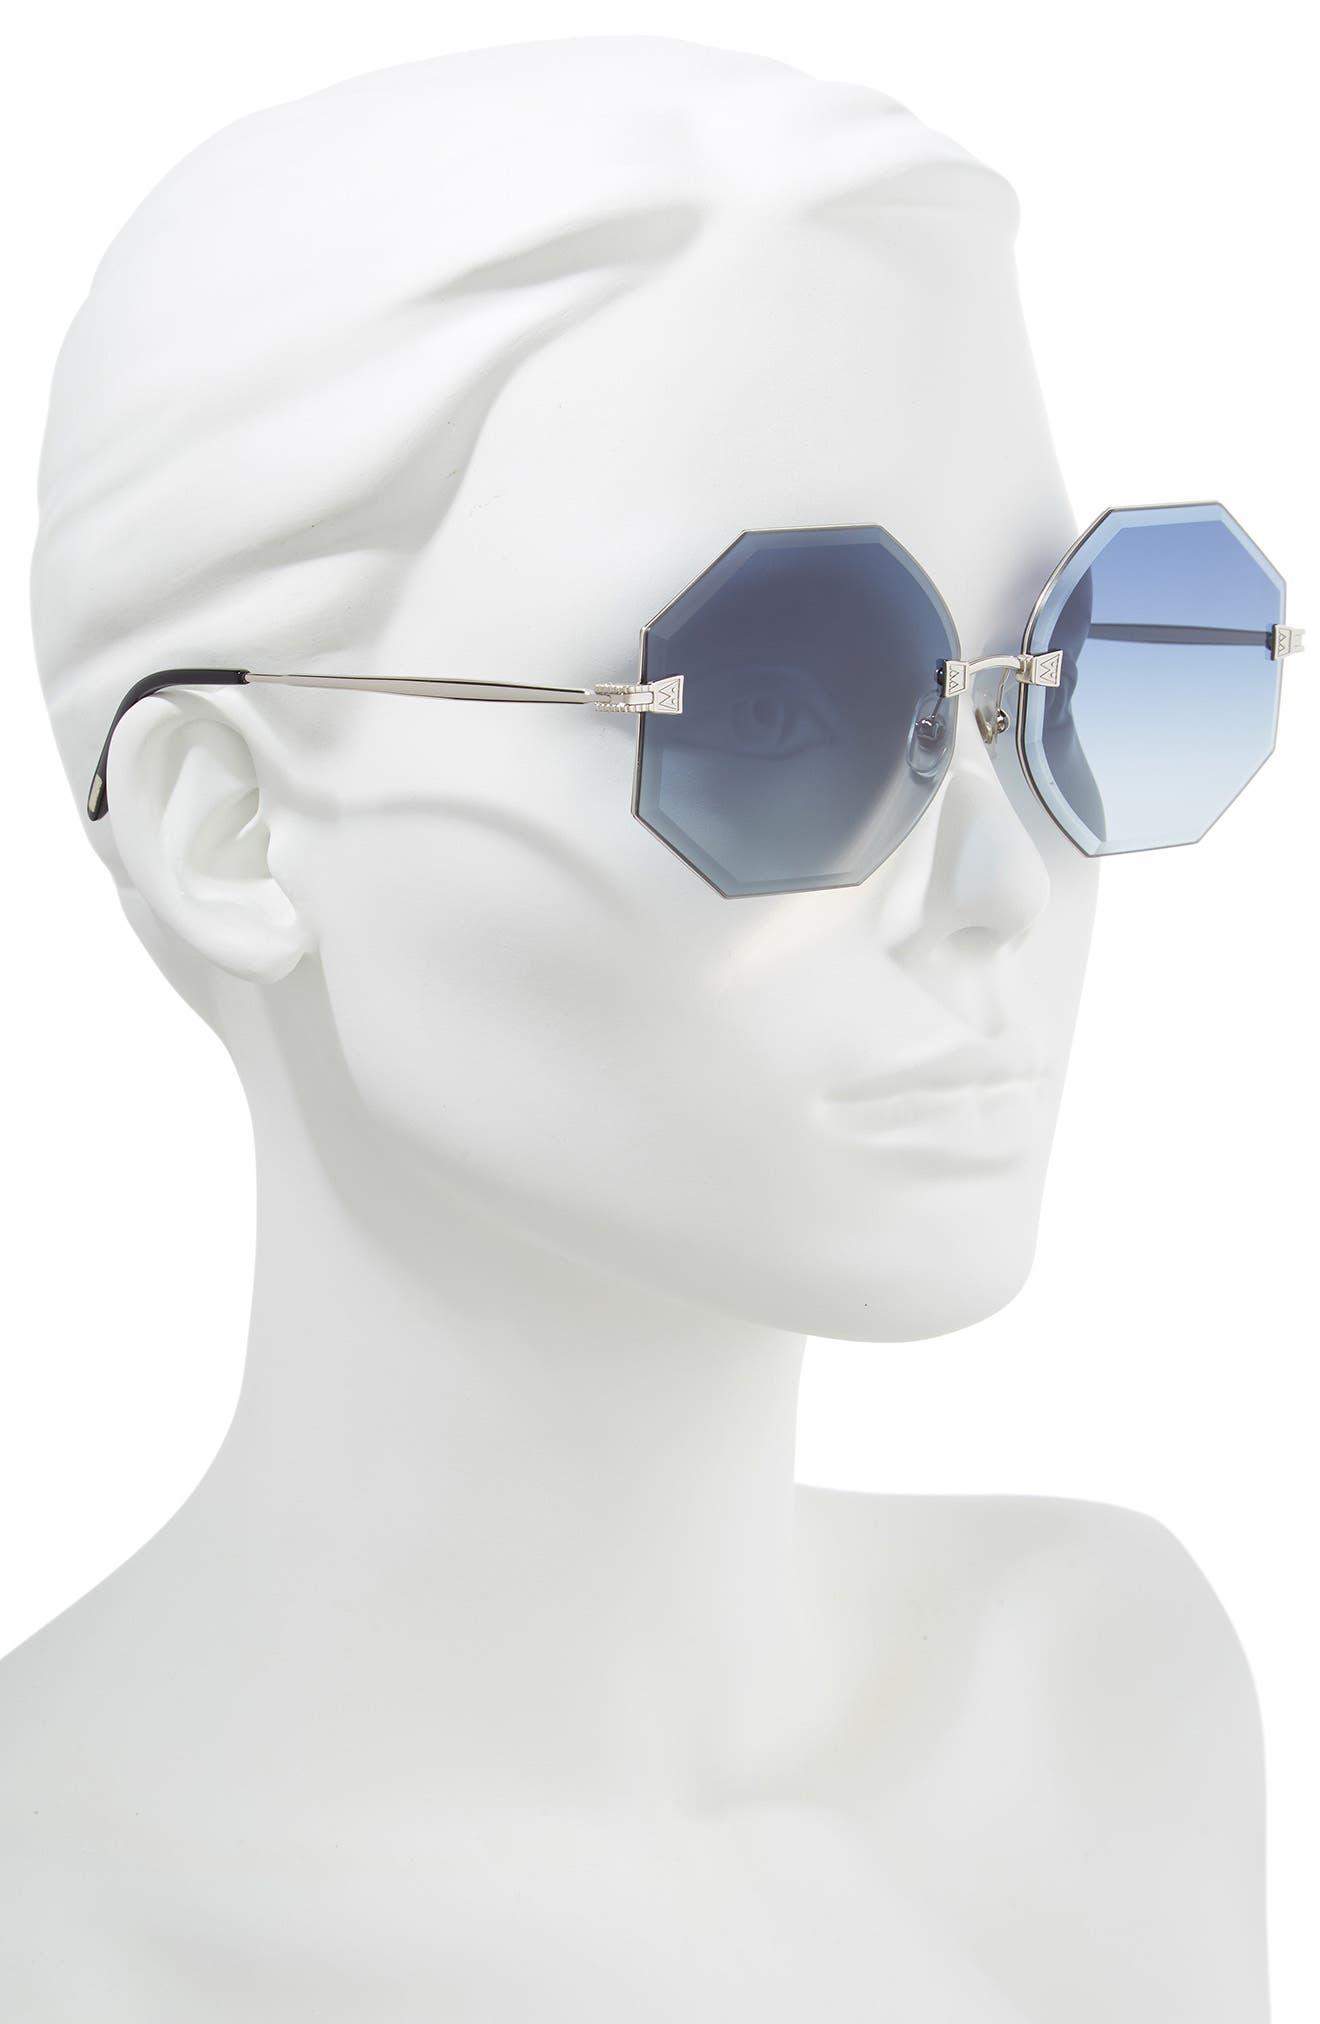 Gem 64mm Oversize Geometric Sunglasses,                             Alternate thumbnail 2, color,                             040